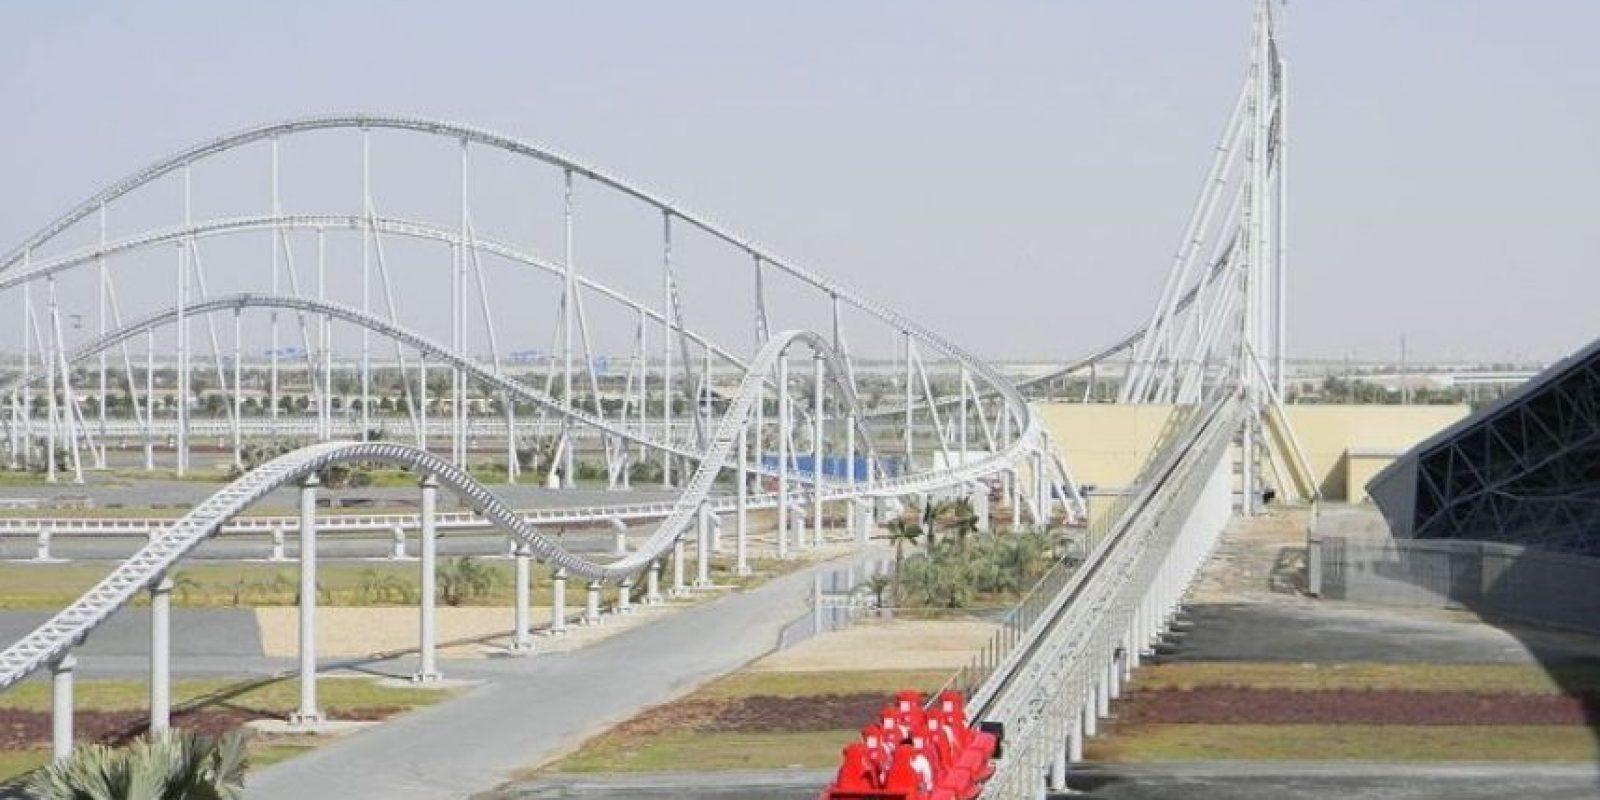 Parque: Ferrari World. Localización: Isla Yas, Abu Dhabi, Emiratos Árabes Unidos. Altura: 52 m. Velocidad: 240 km/h. Longitud: dos mil 70 m. Caída: 51 m Foto:Wikimedia